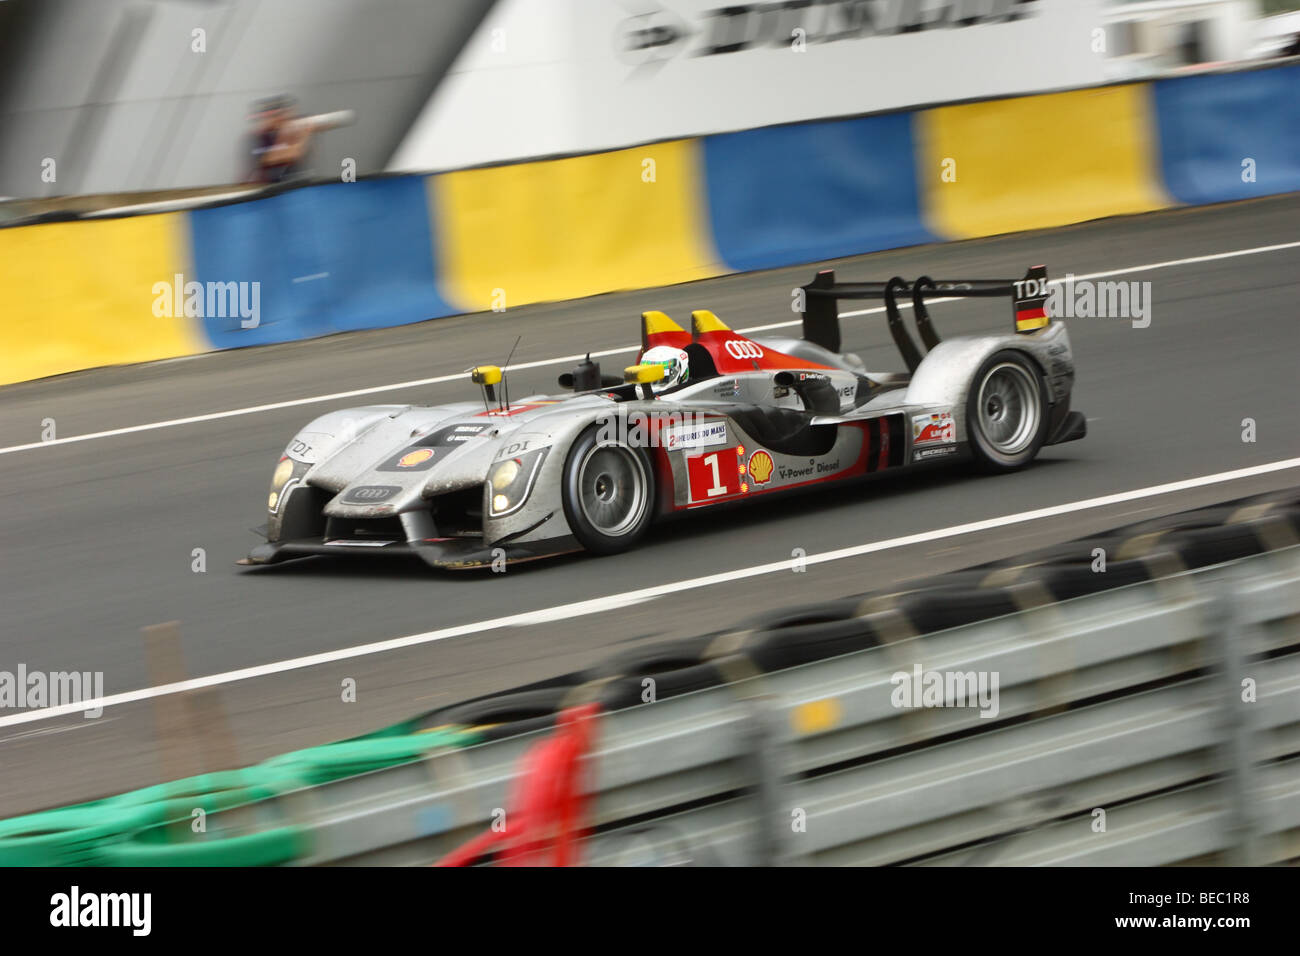 24 Stunden von Le Mans 2009 - Audi R15 TDI N ° 1 Stockbild